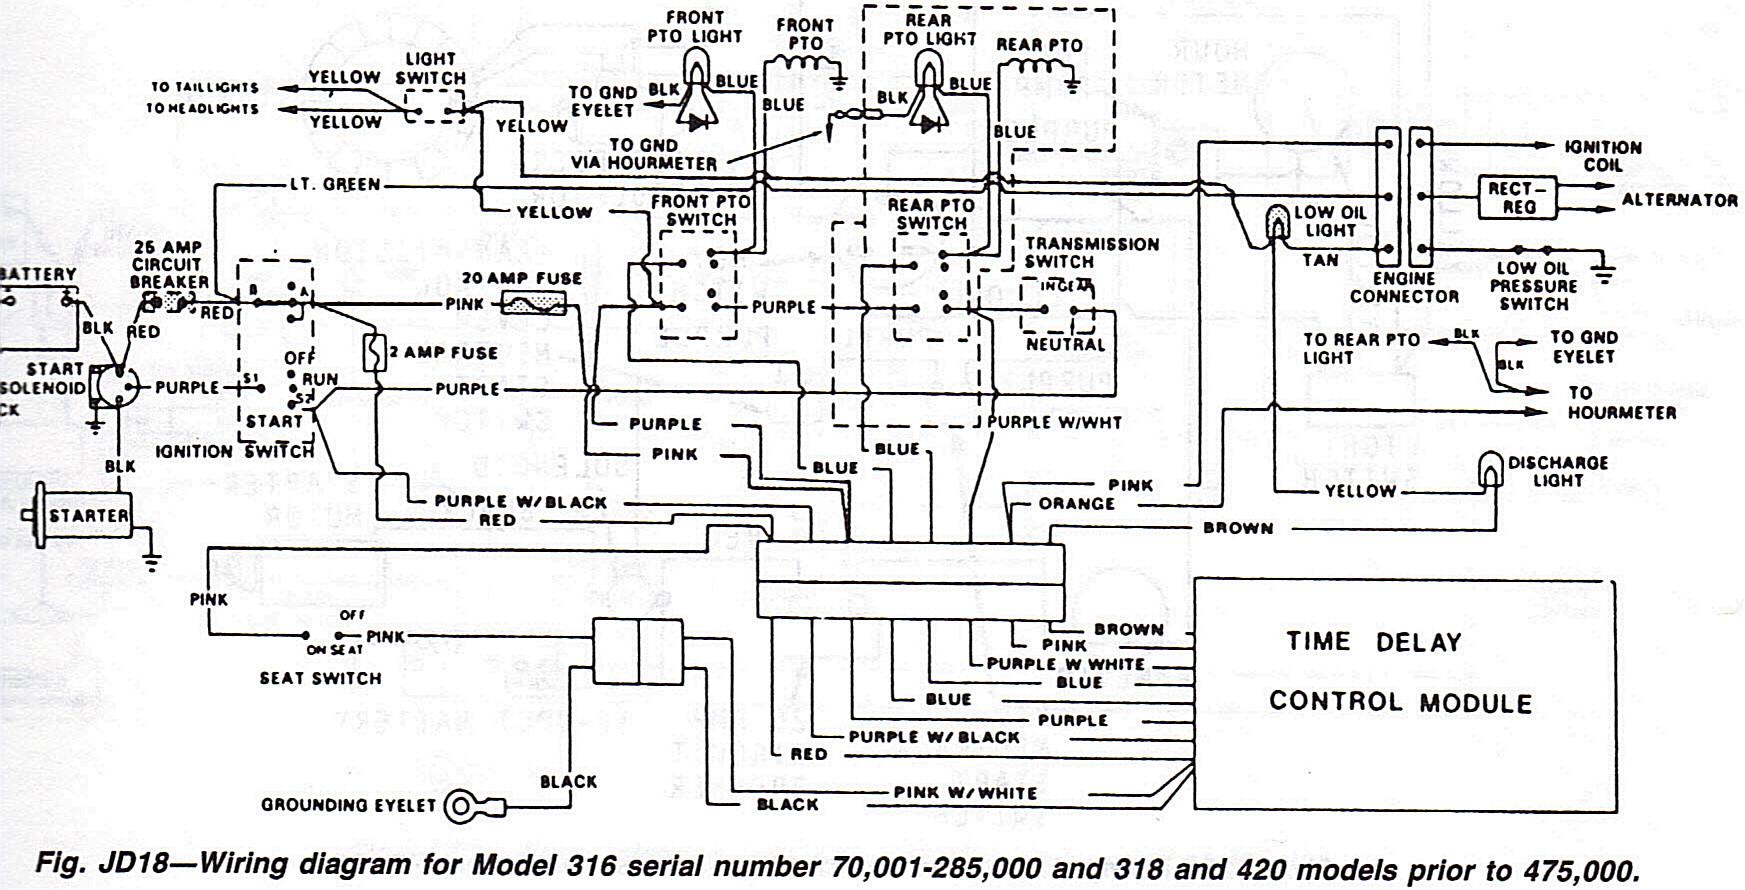 Schema Electrique John Deere Gx75